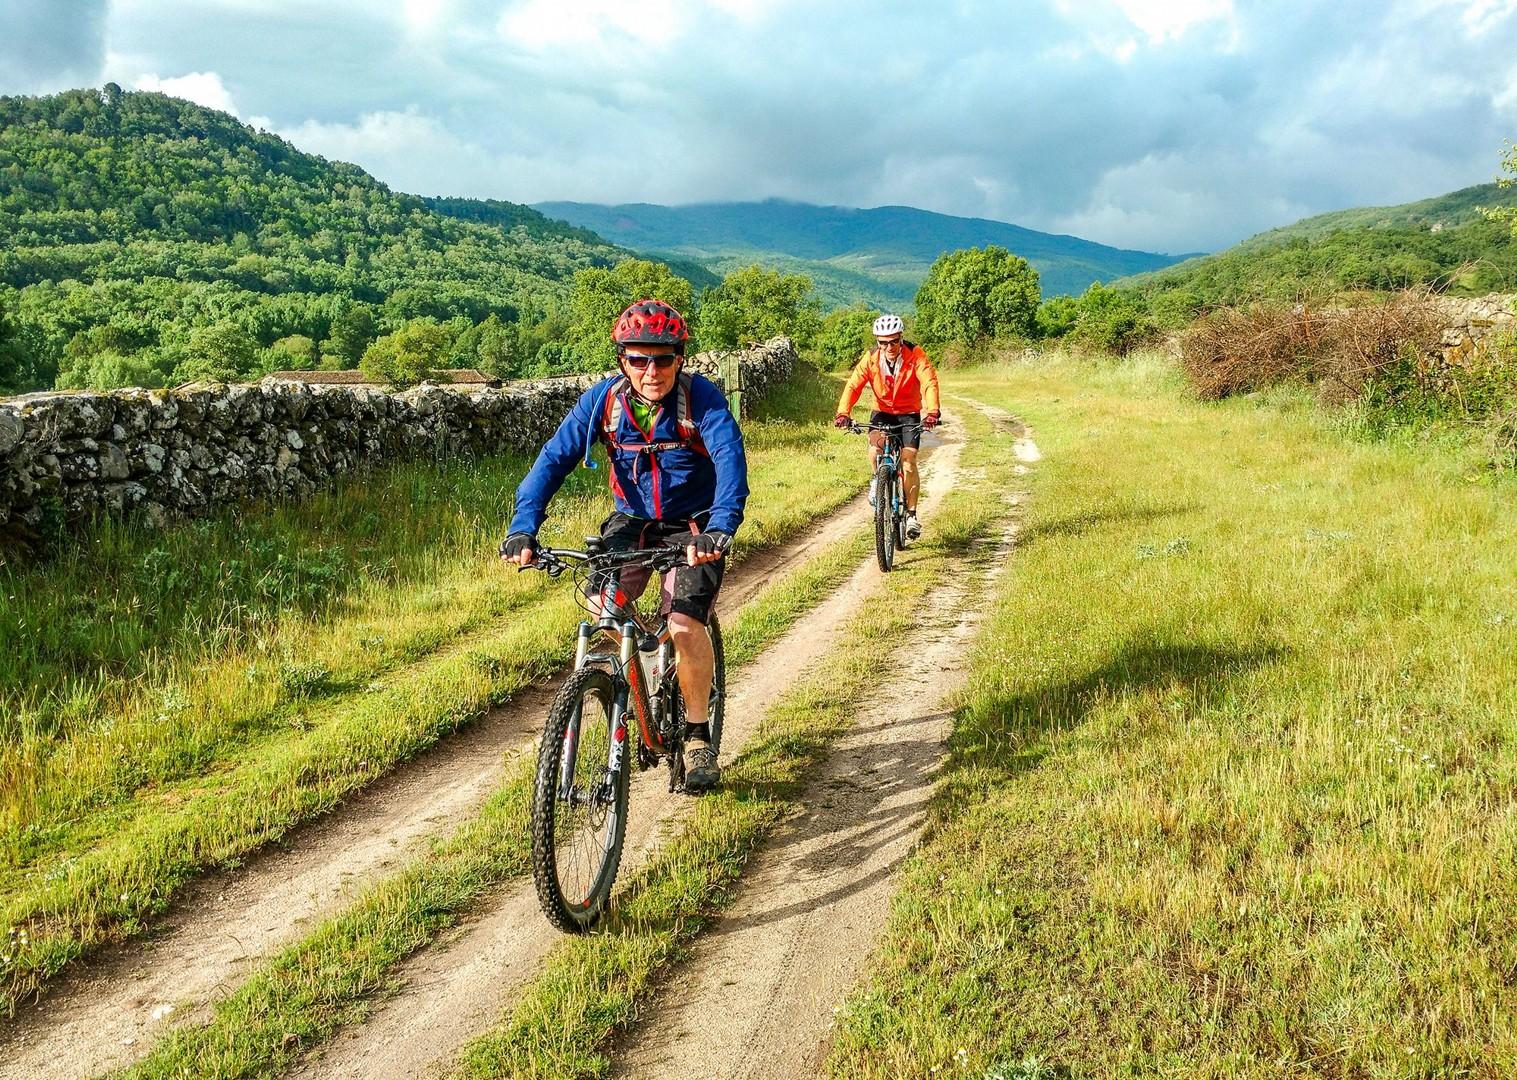 IMG_20170513_093245726.jpg - Spain - Ruta de la Plata - Guided Mountain Bike Holiday - Mountain Biking